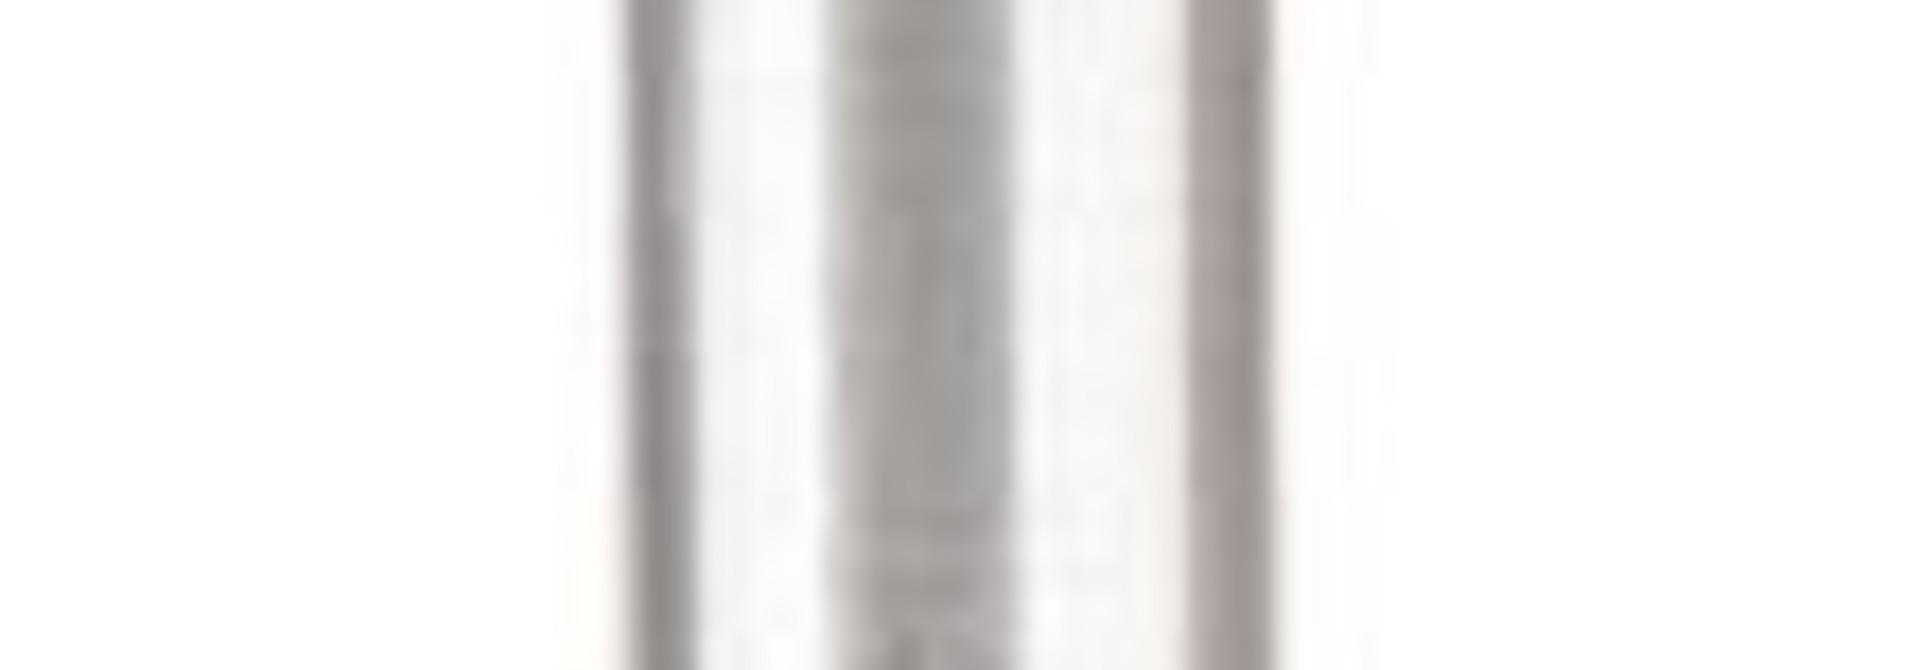 170548 Präzisionsbastelmesser